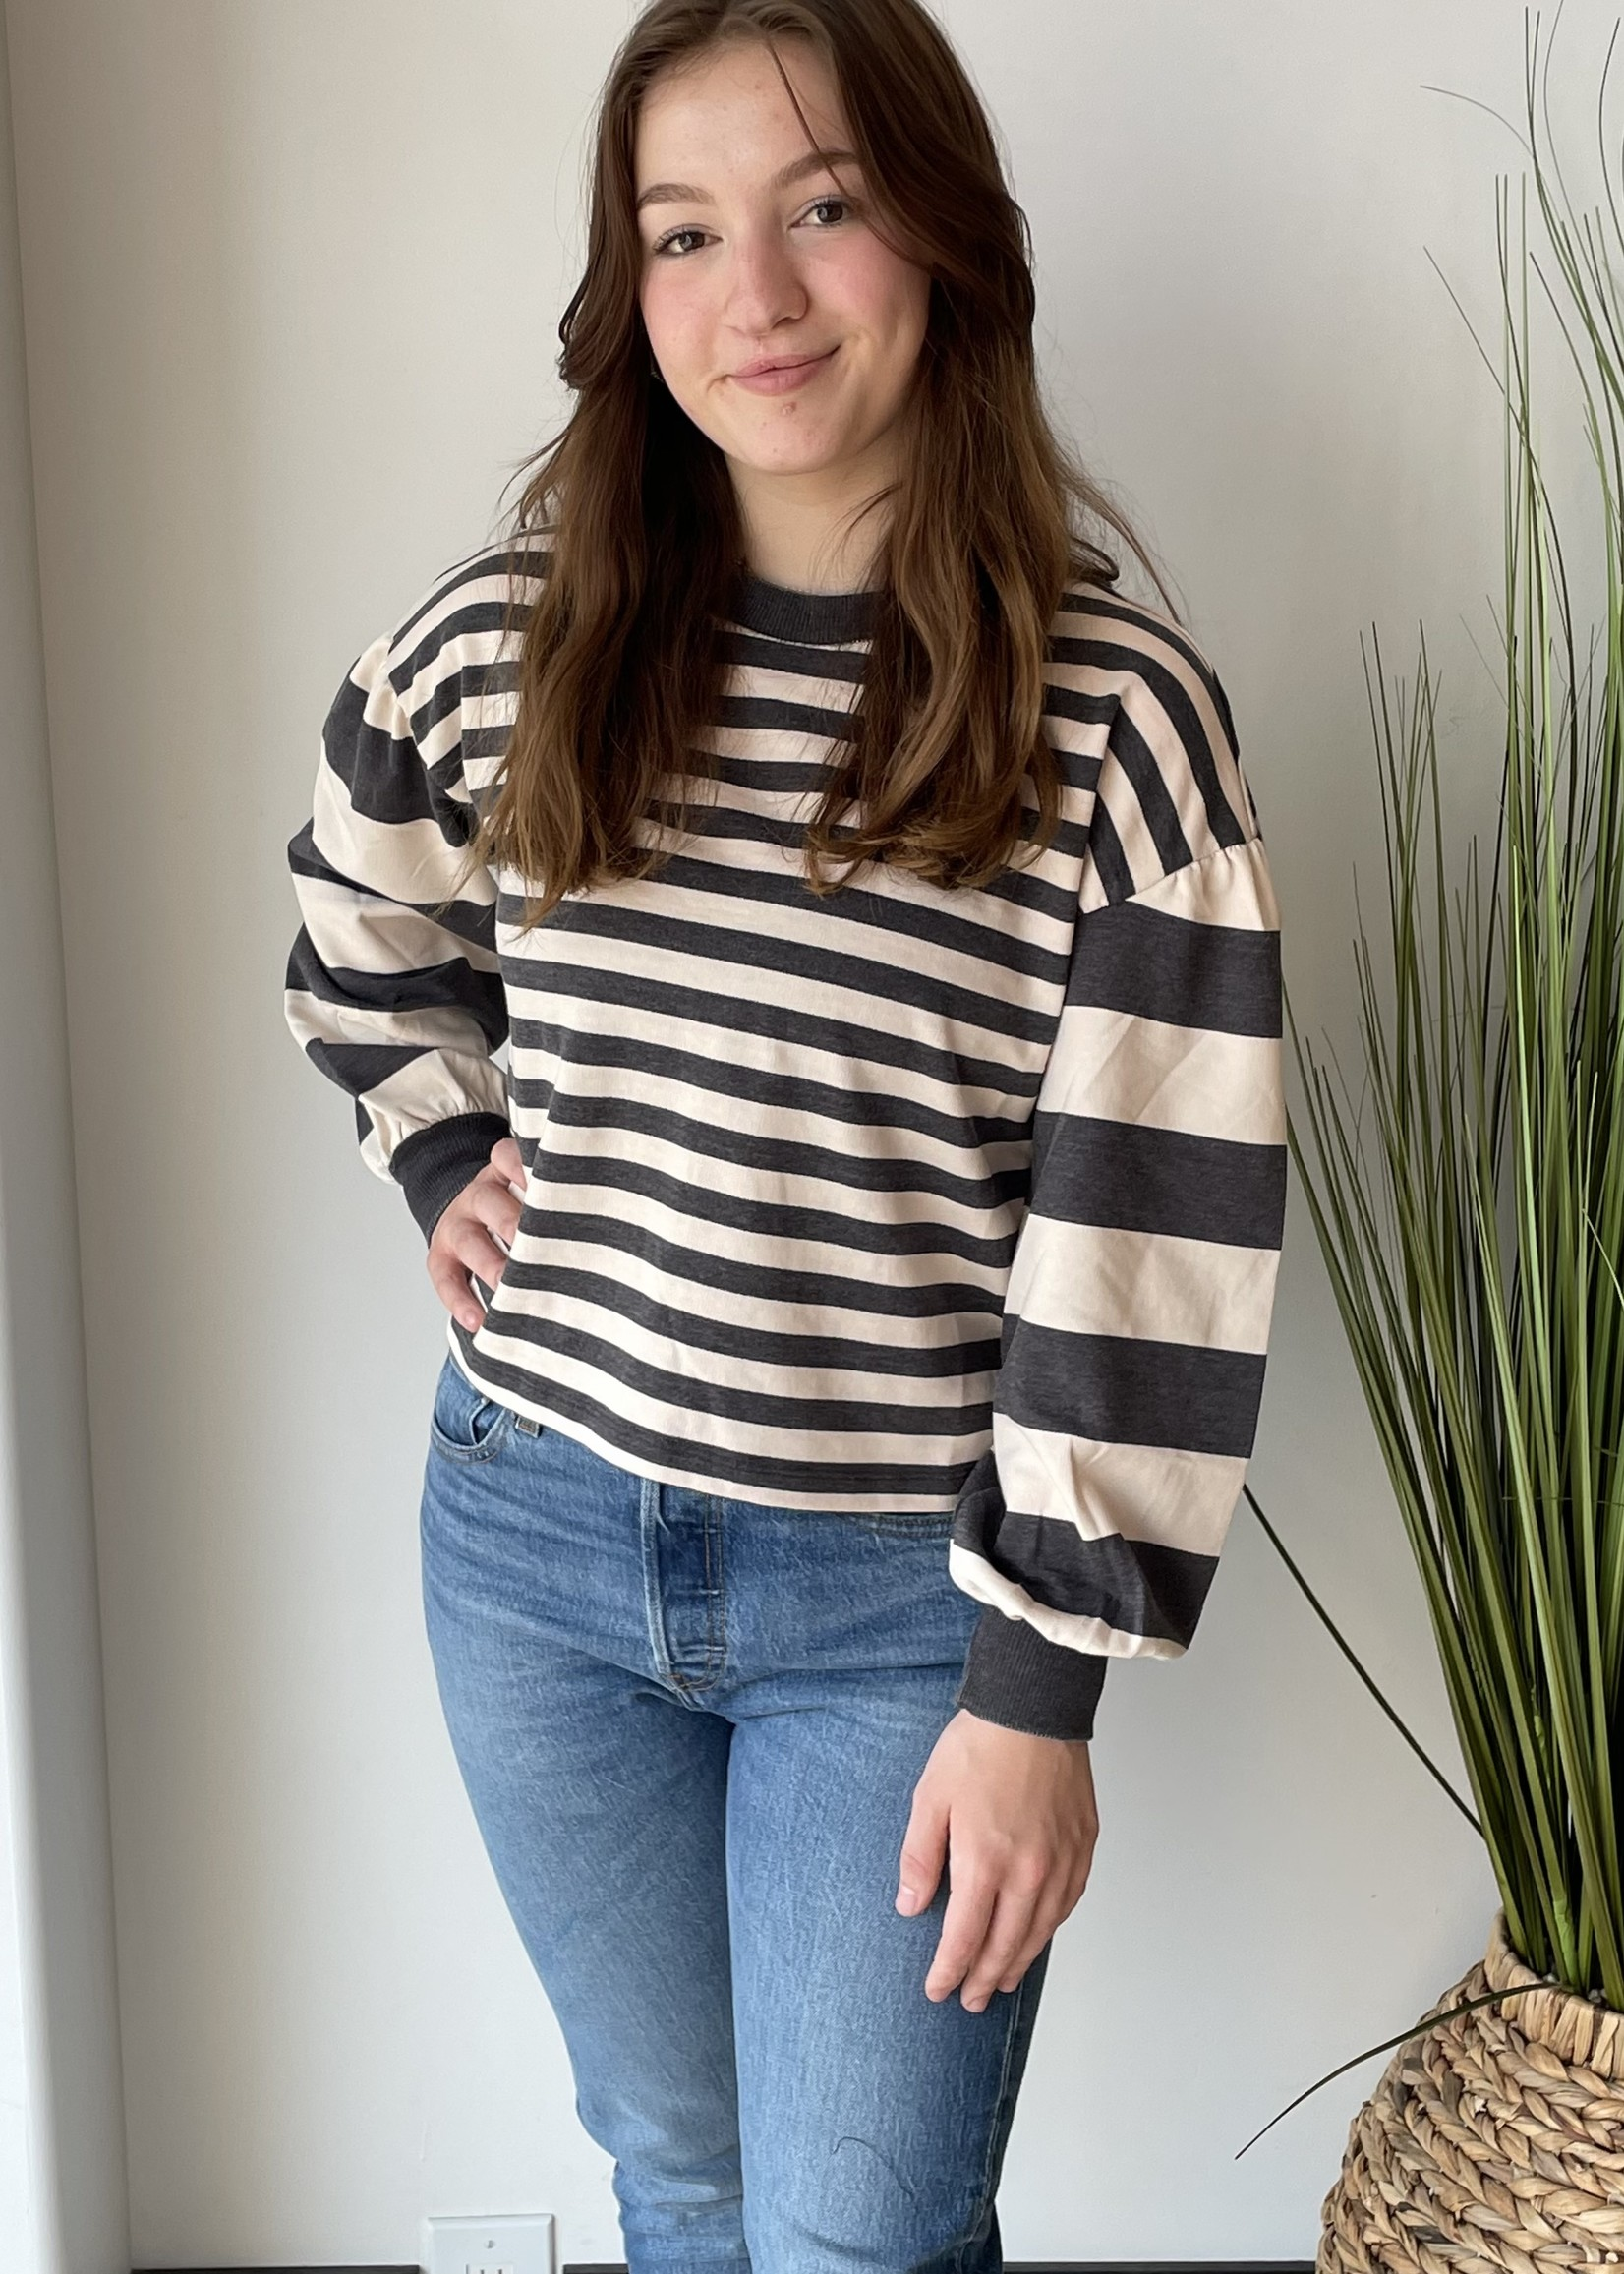 Tempest Stripe Shirt